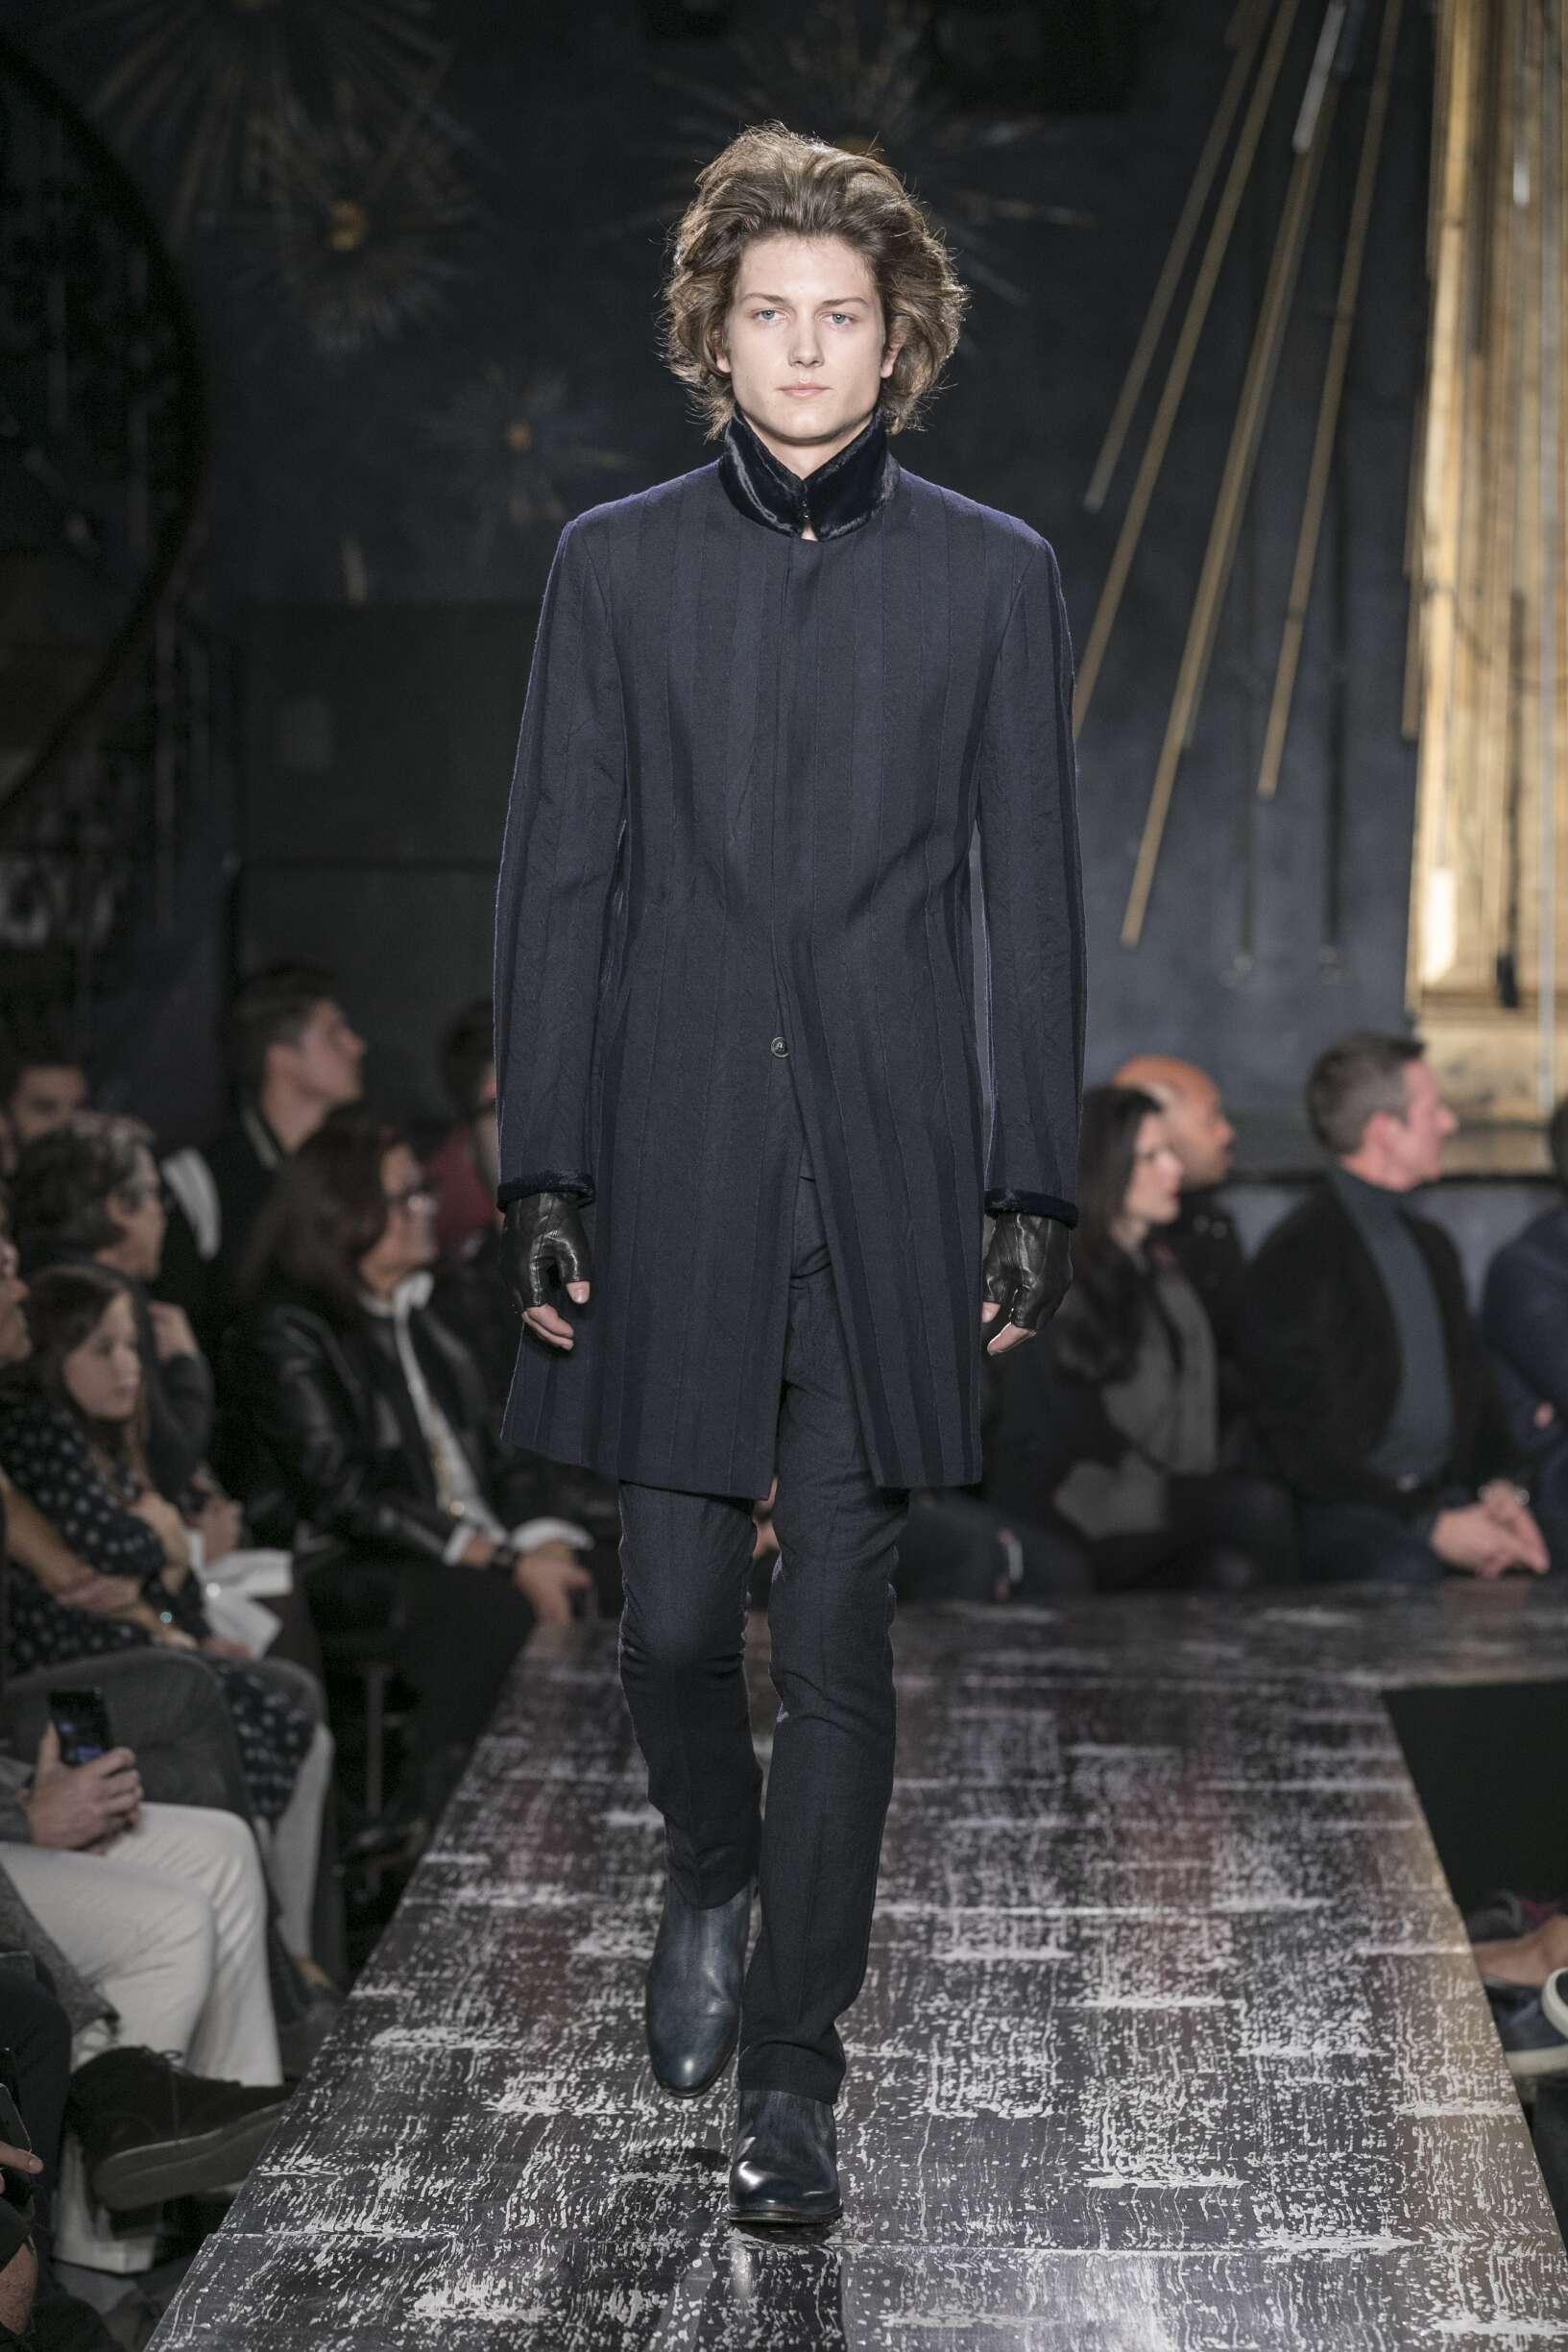 Catwalk John Varvatos Man Fashion Show Winter 2017